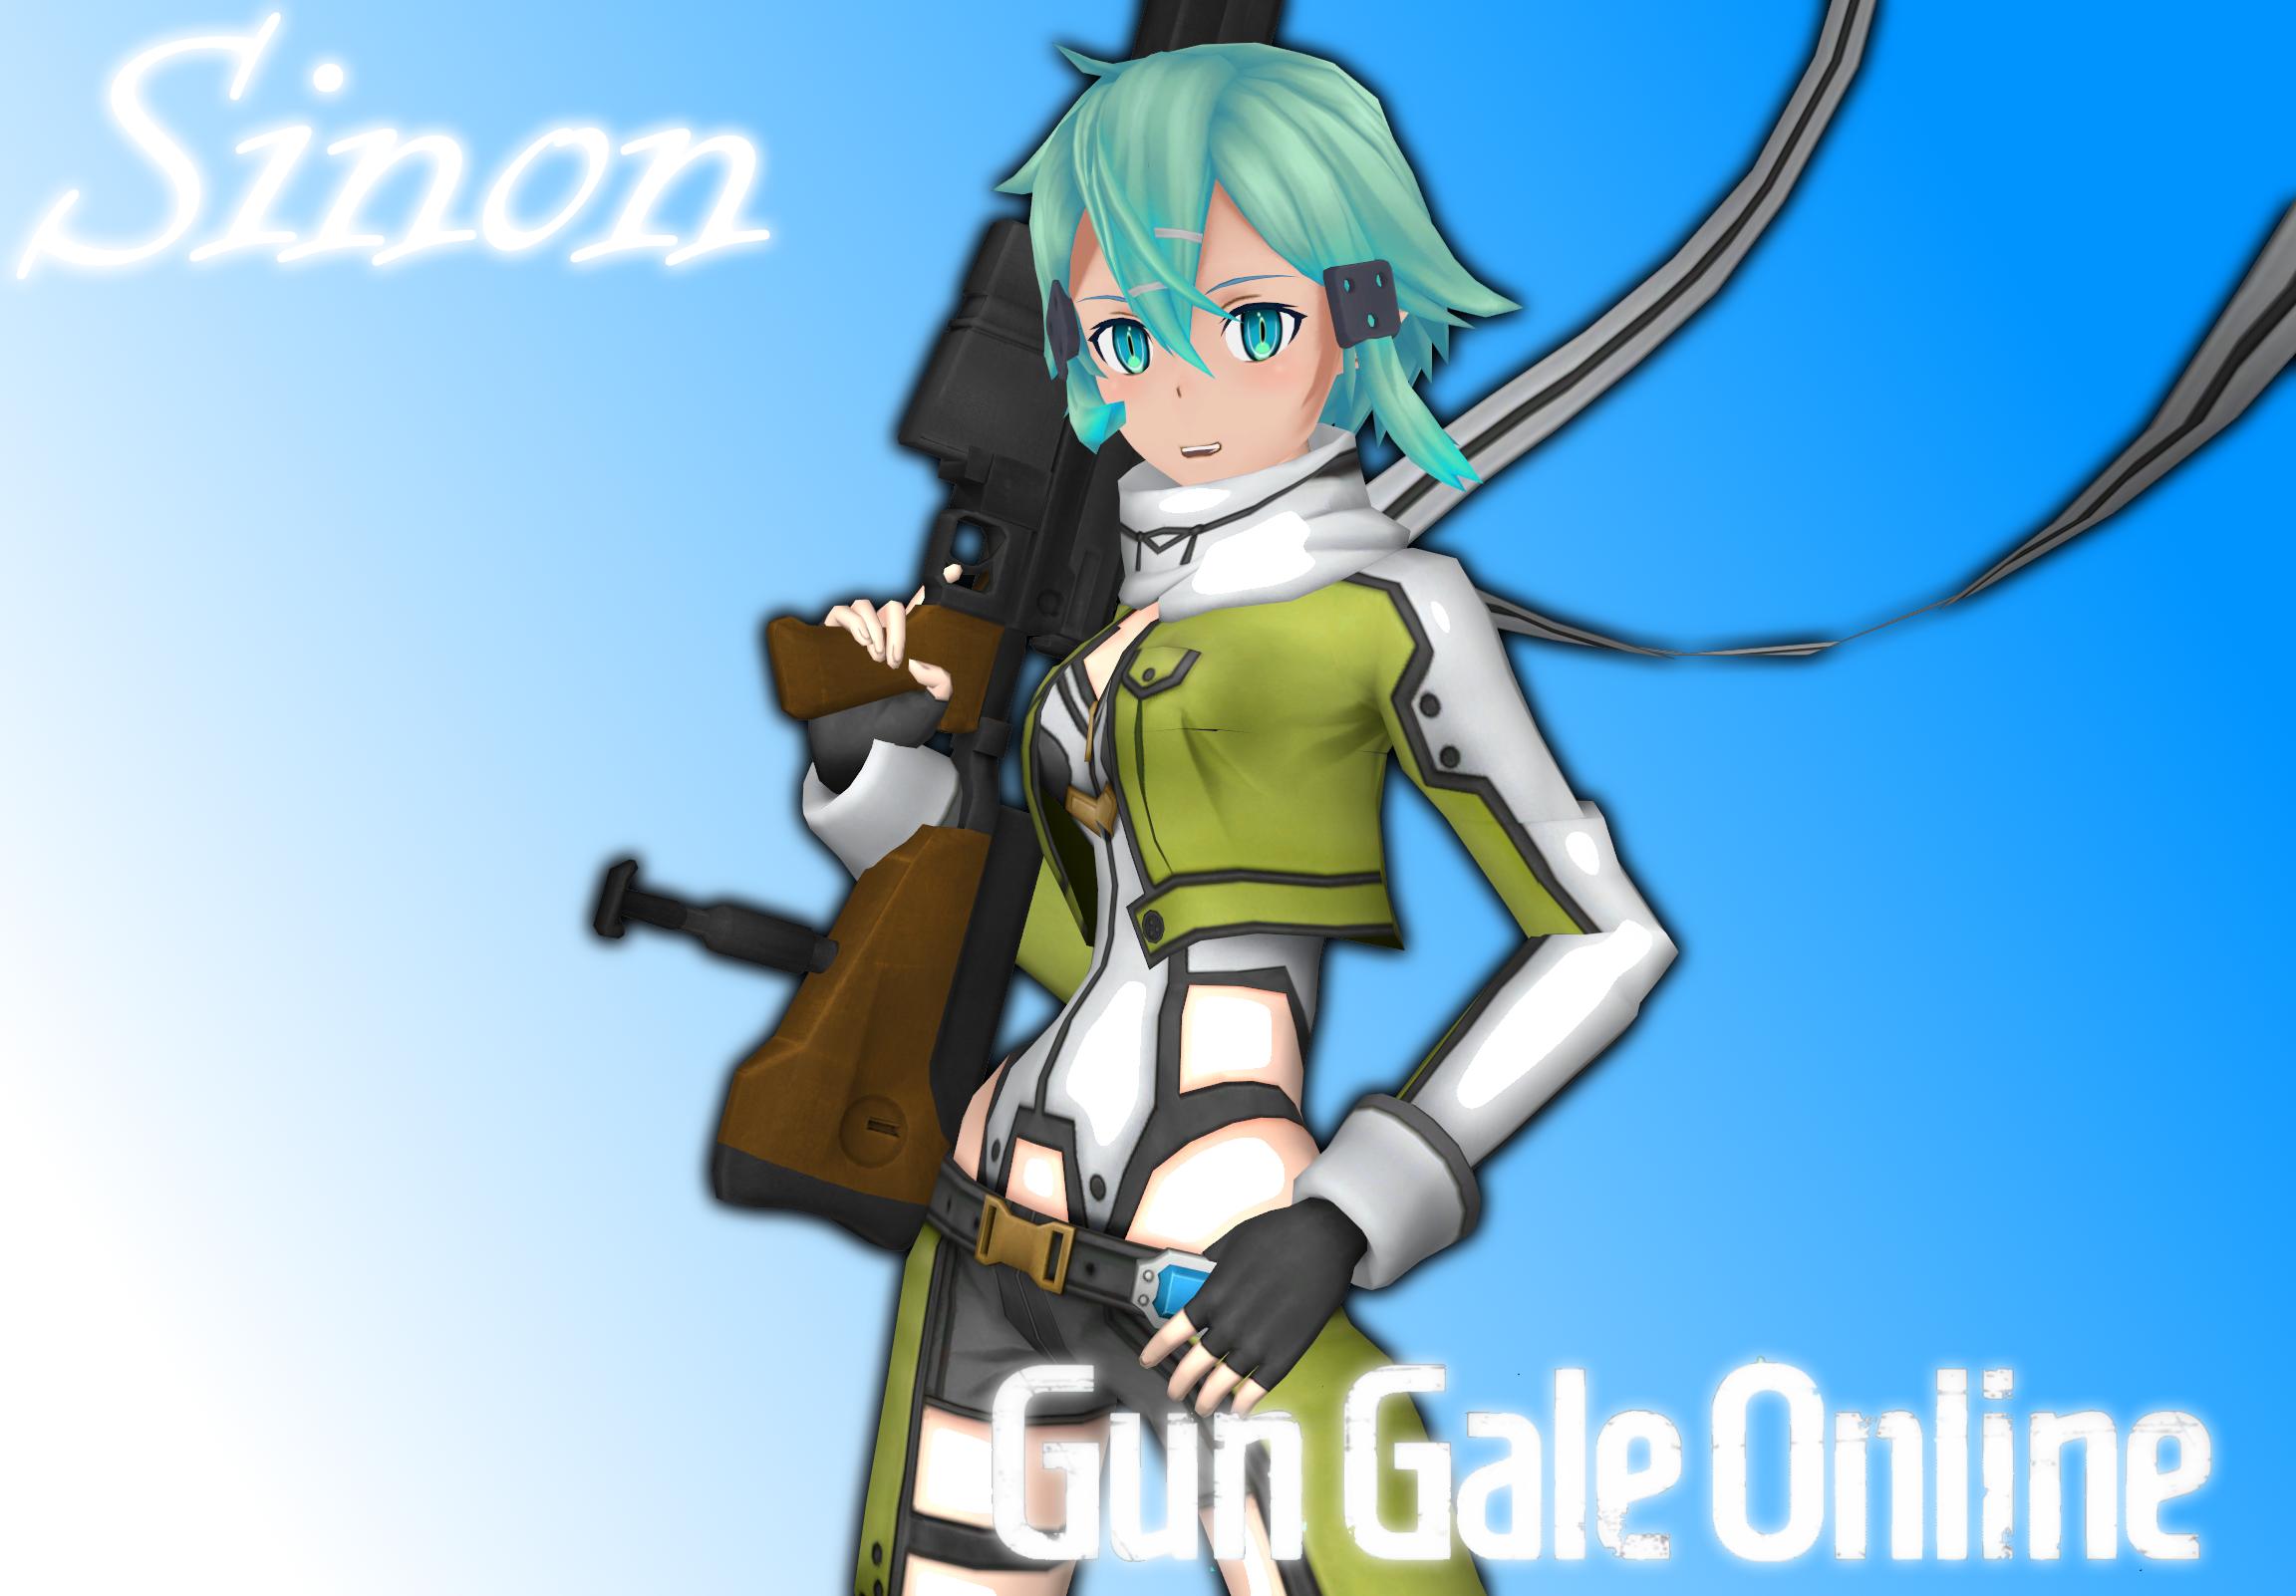 Gun Gale Online - Sinon by o0Cristian0o on DeviantArt